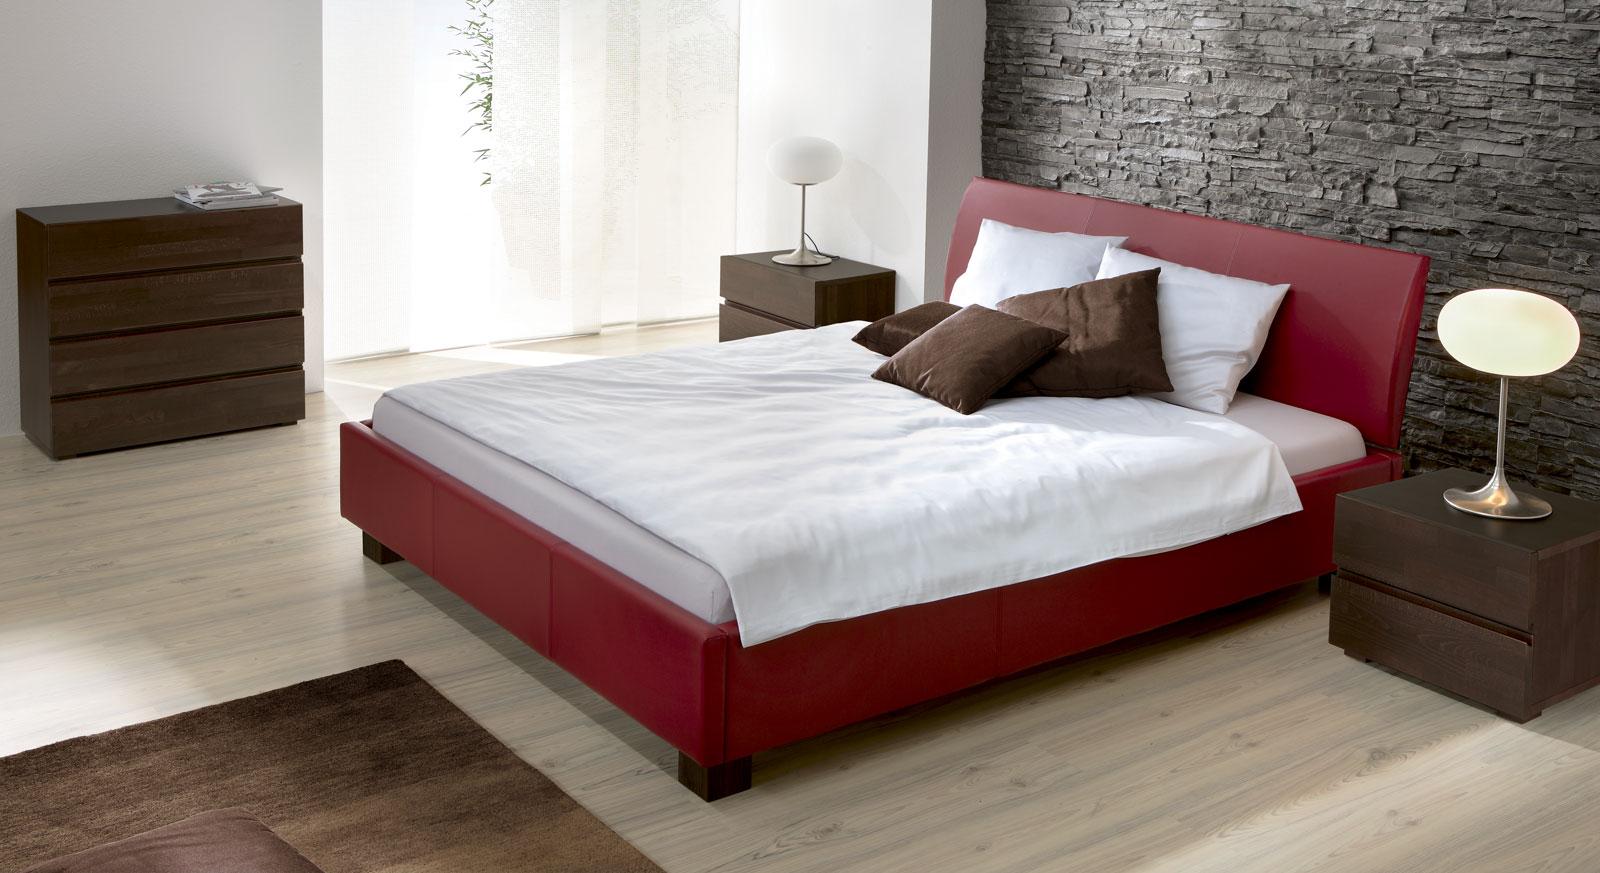 bett mit hohem kopfteil fotos das sieht elegantes mobelpix. Black Bedroom Furniture Sets. Home Design Ideas